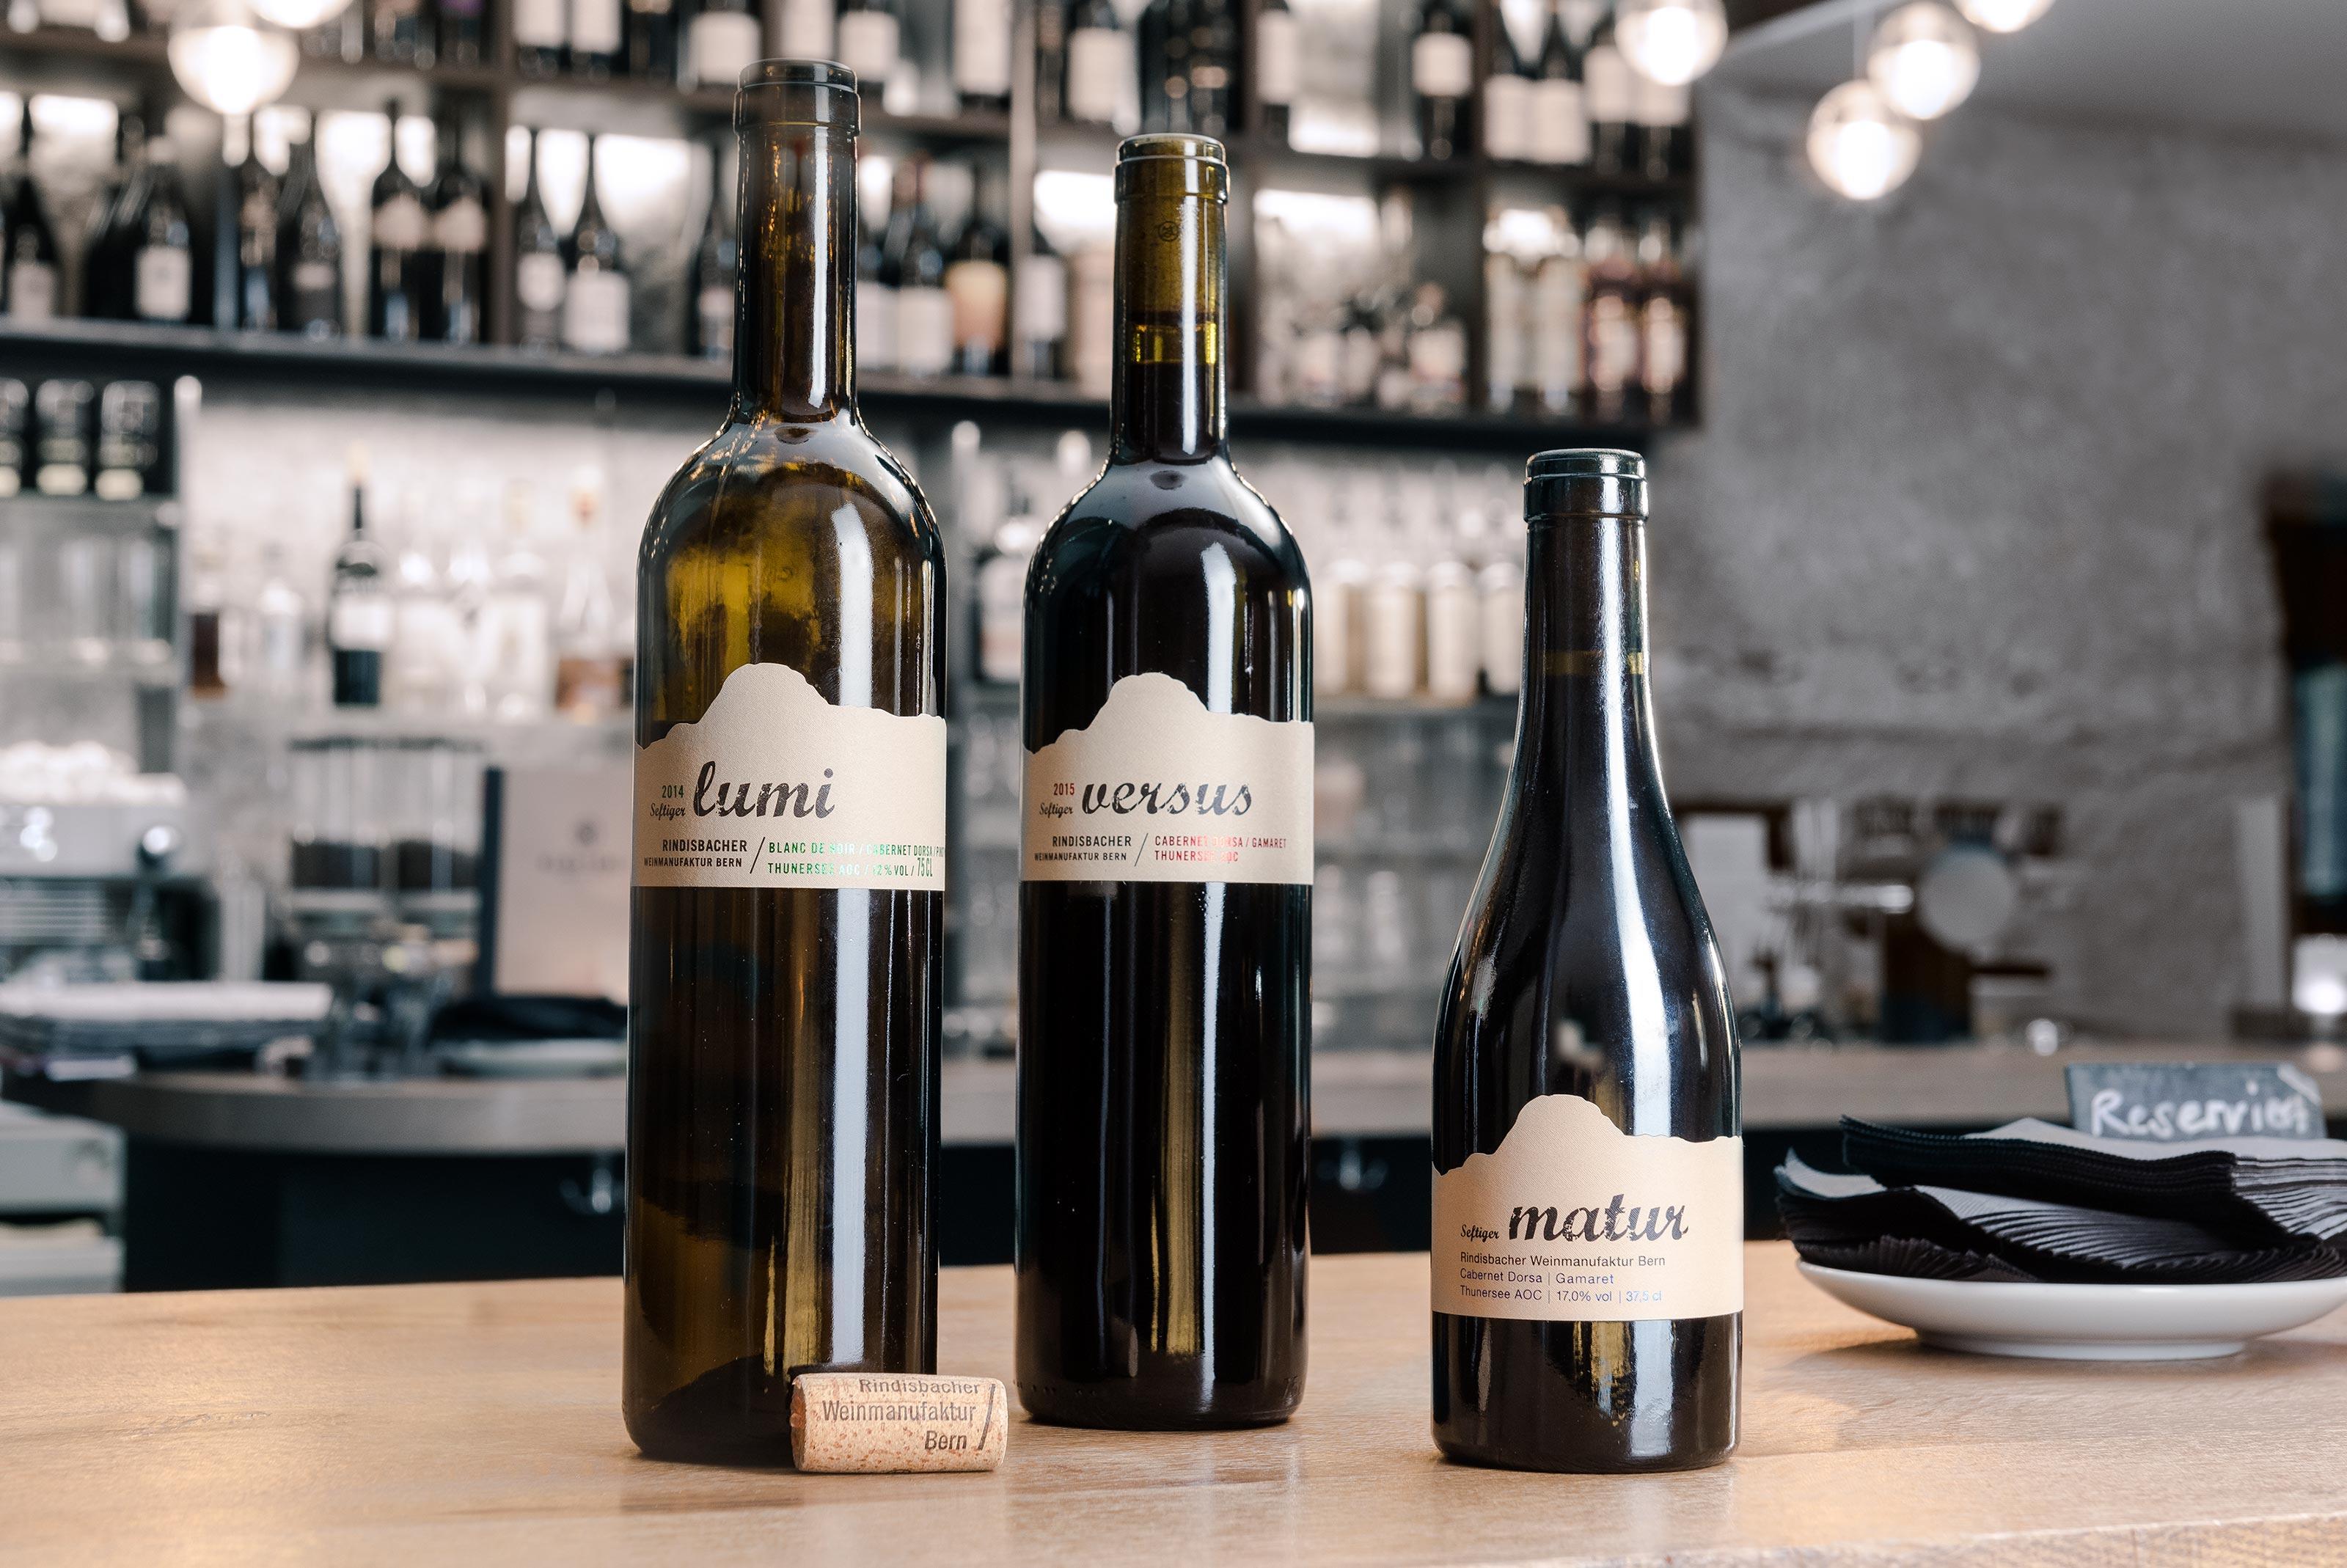 Rindisbacher Weinmanufaktur – bottles, Lumi, Versus, Matur ©Atelier Pol × Barbara Hess × Klösterli